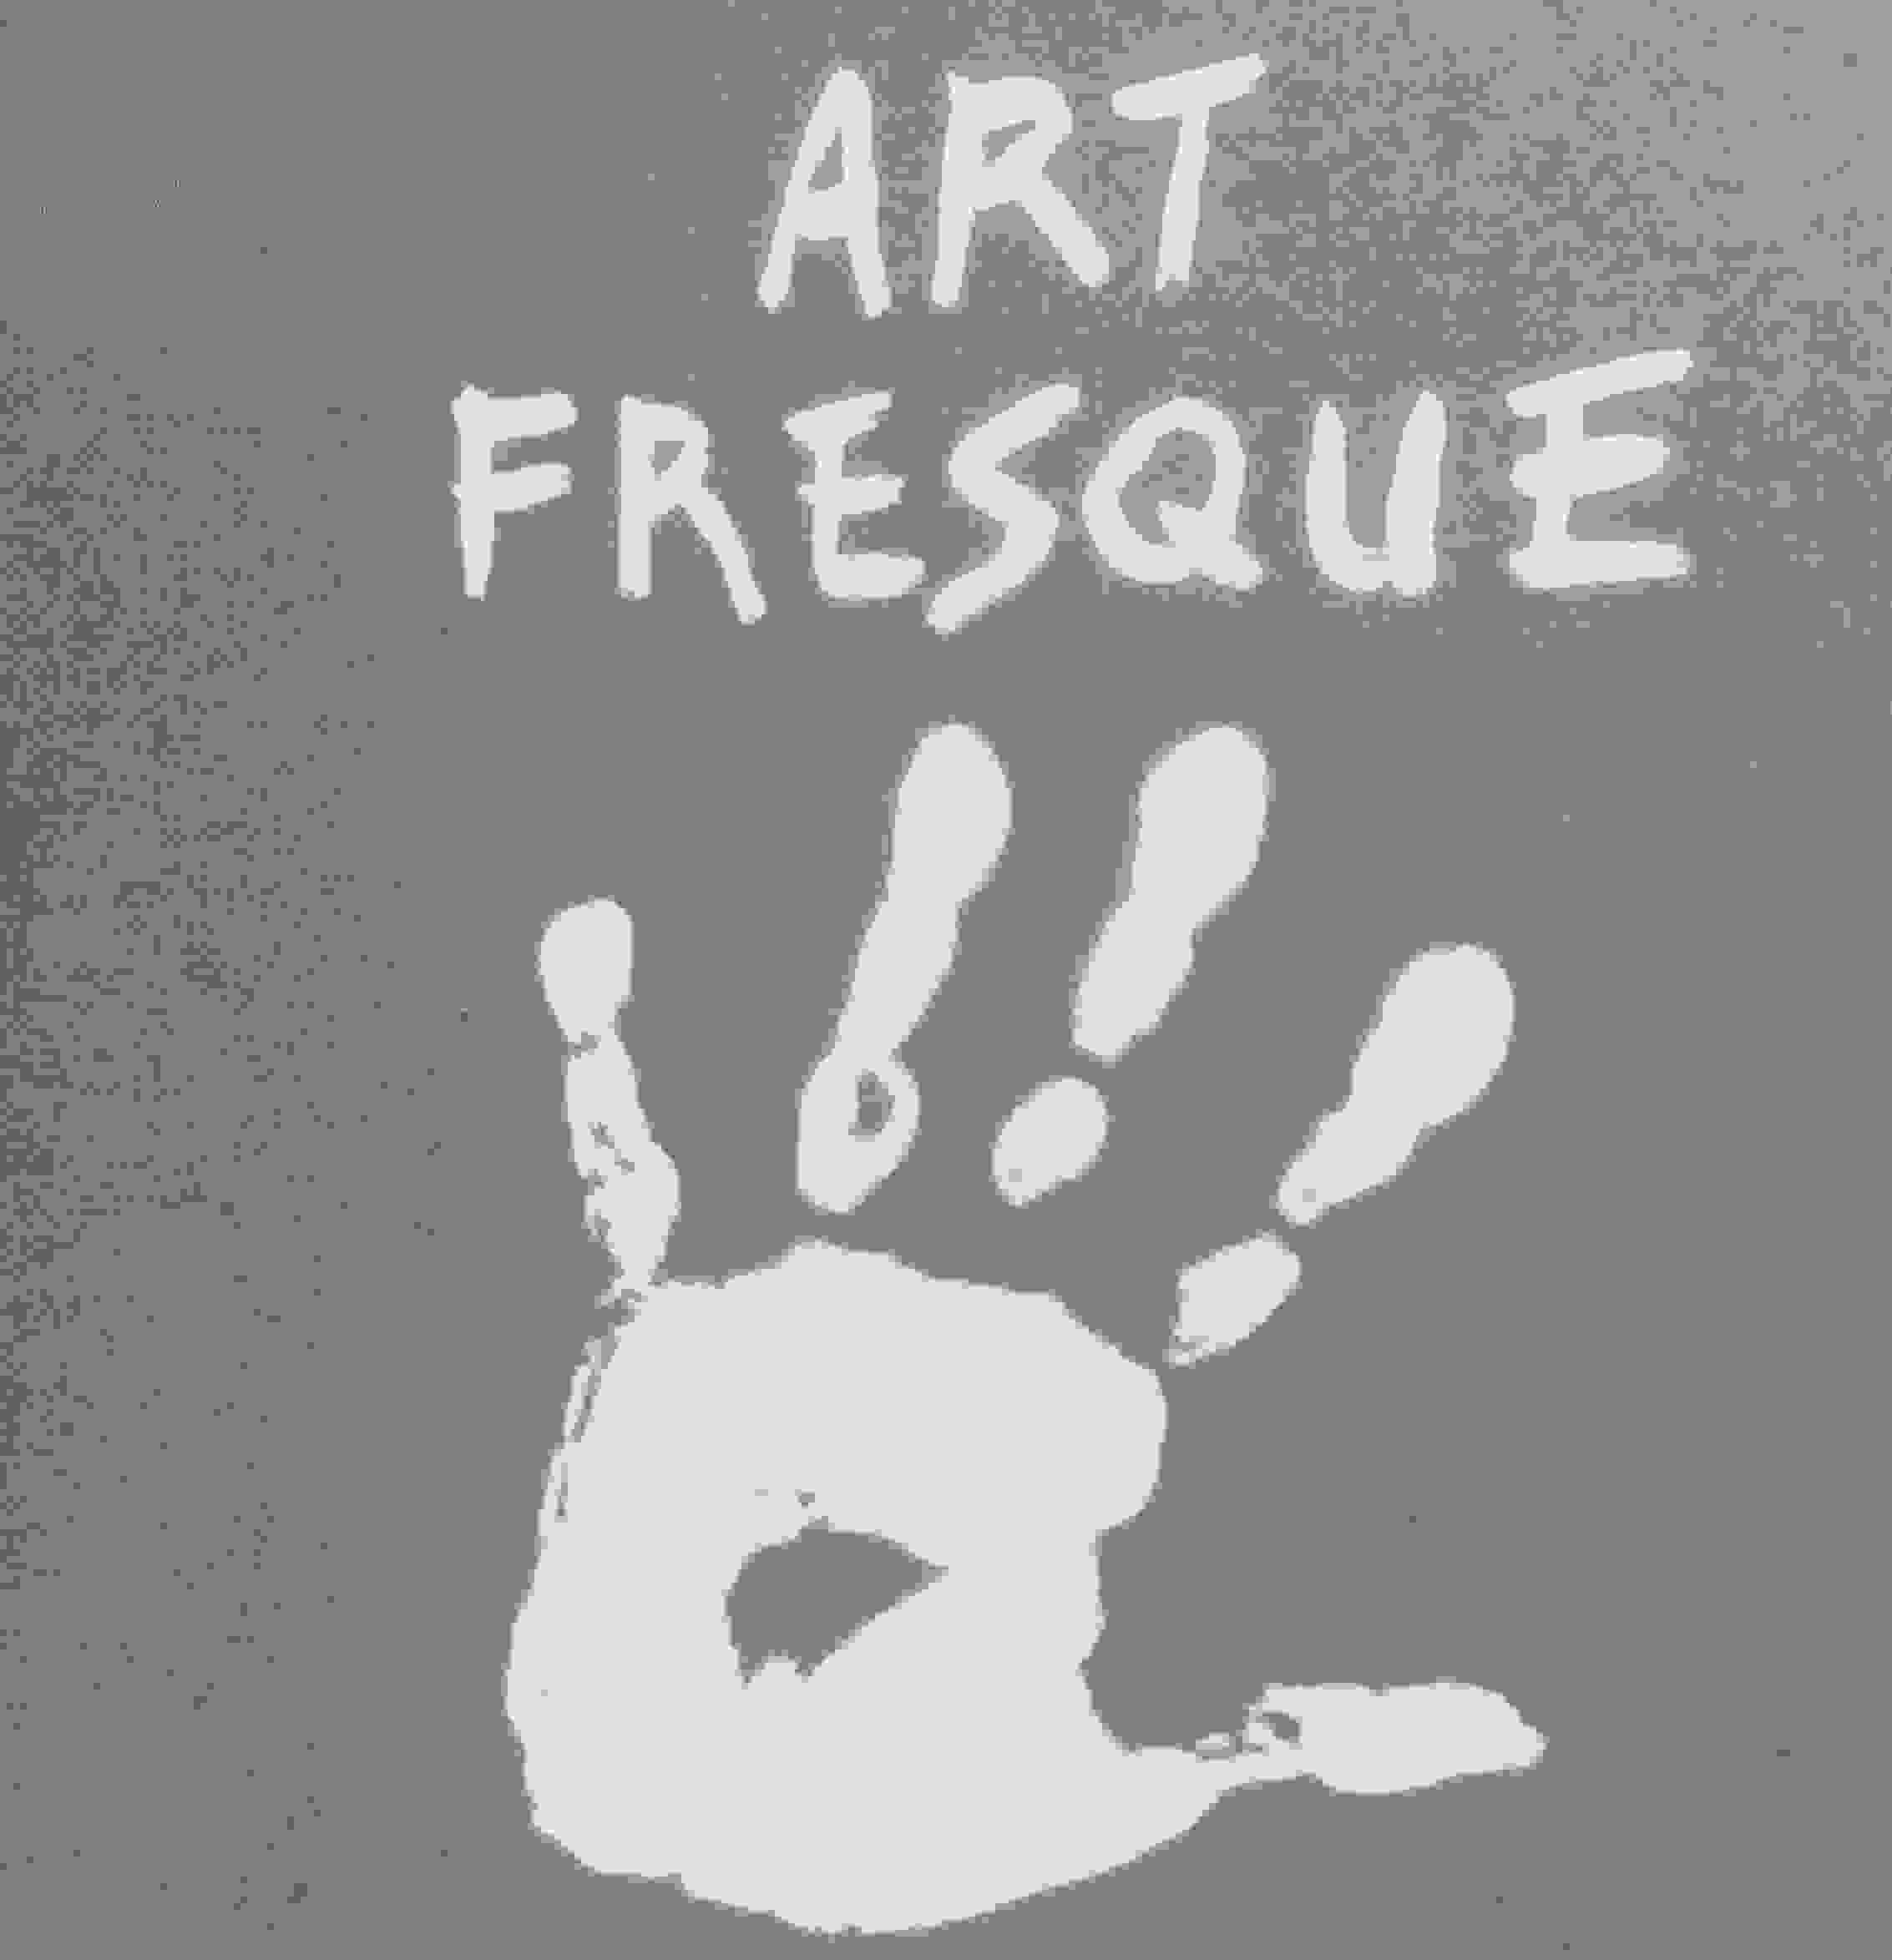 art-fresque